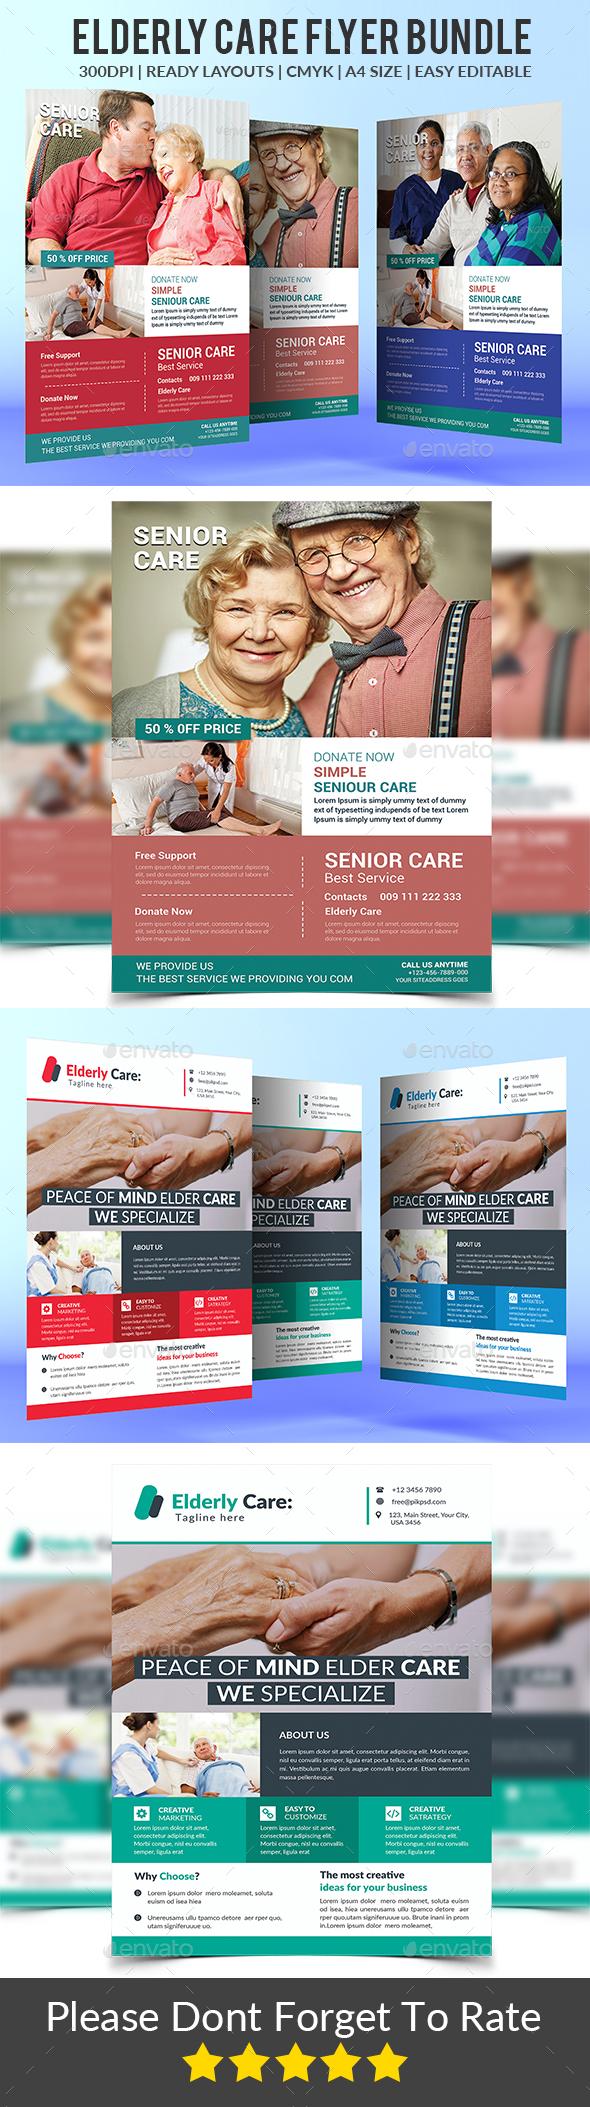 Elderly Care Flyers Bundle - Corporate Flyers